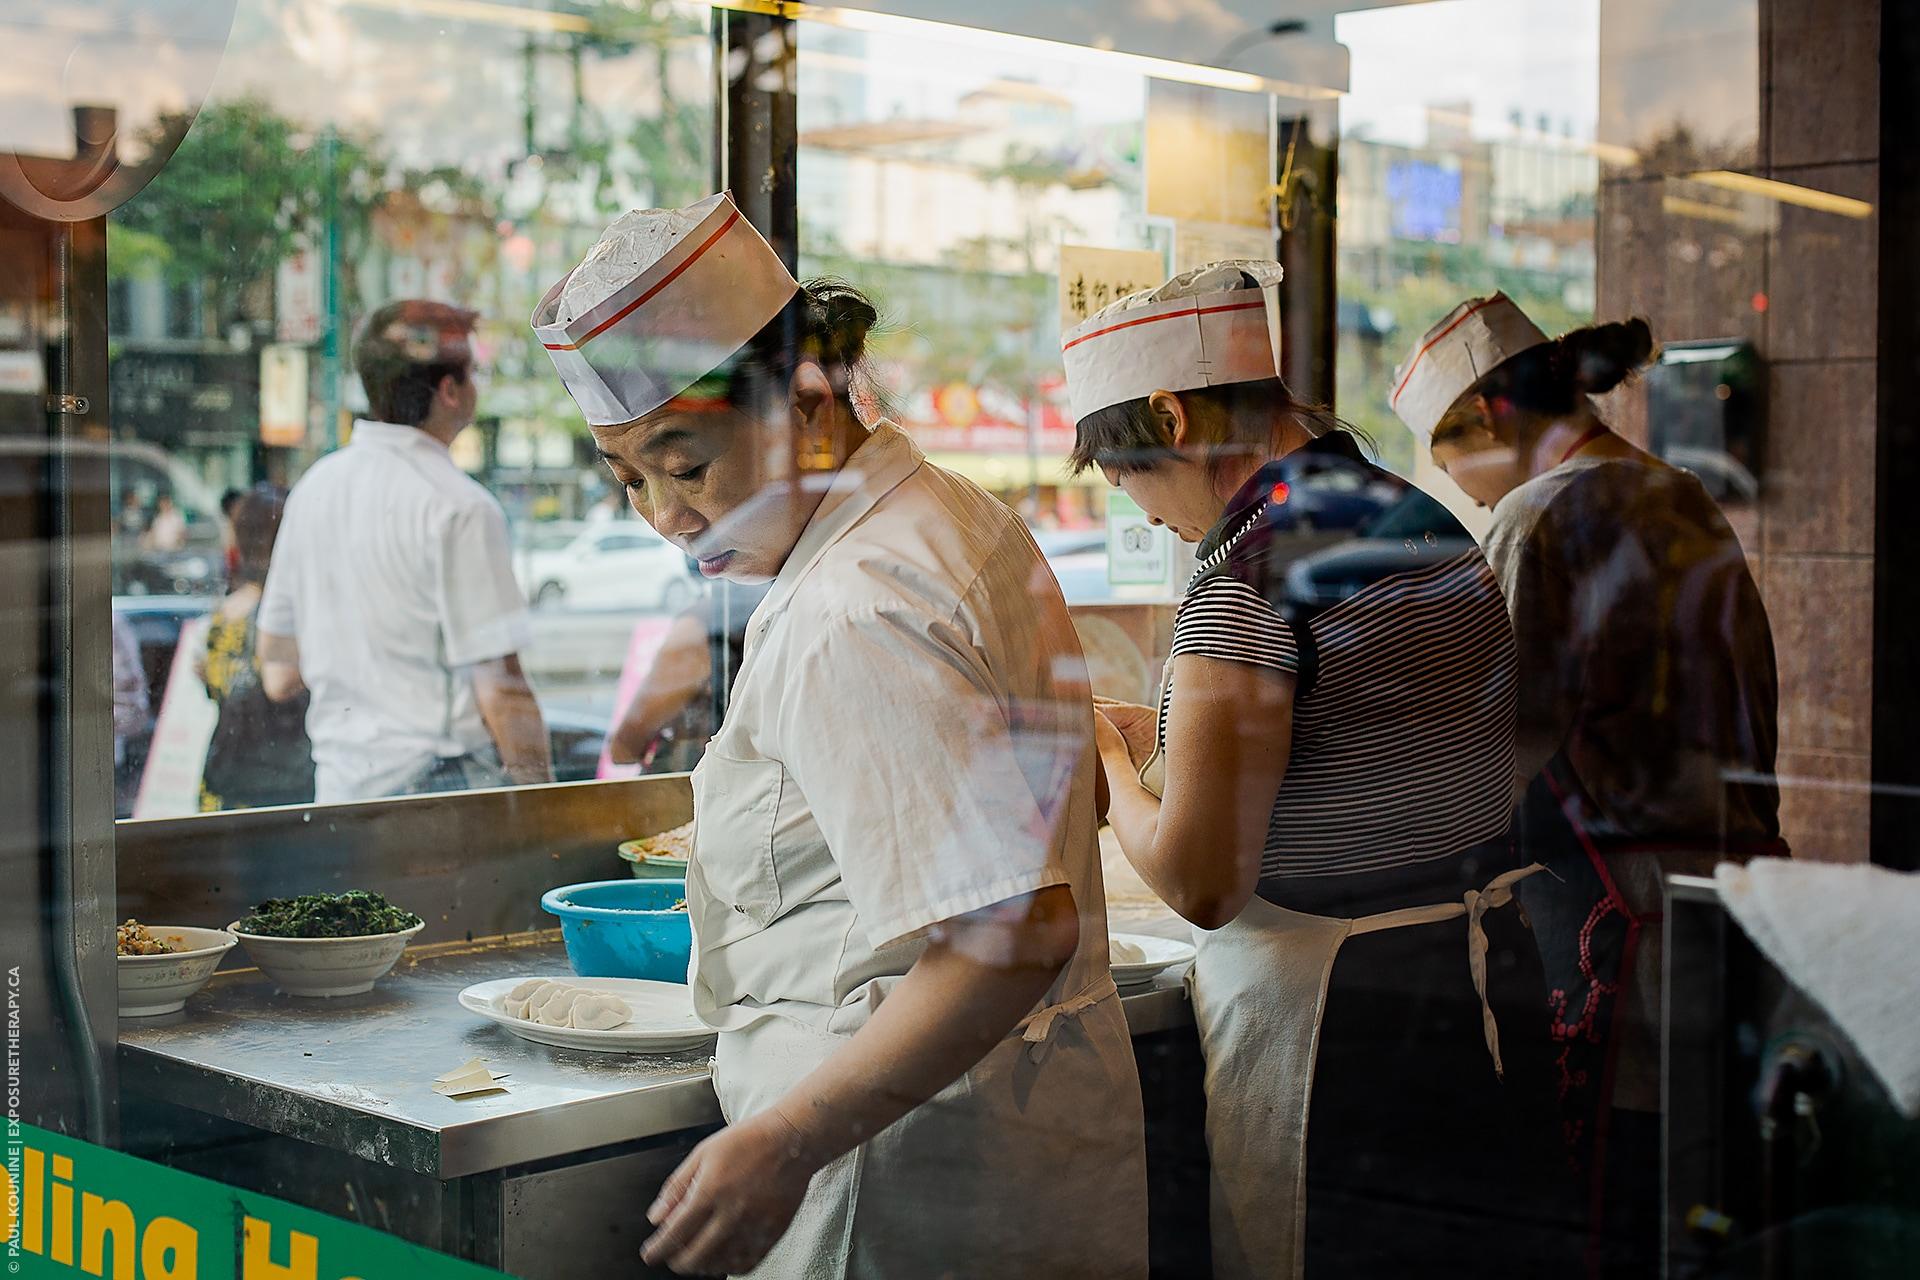 normal 50mm lens on fullframe camera in Toronto Chinatown dumpling restaurant